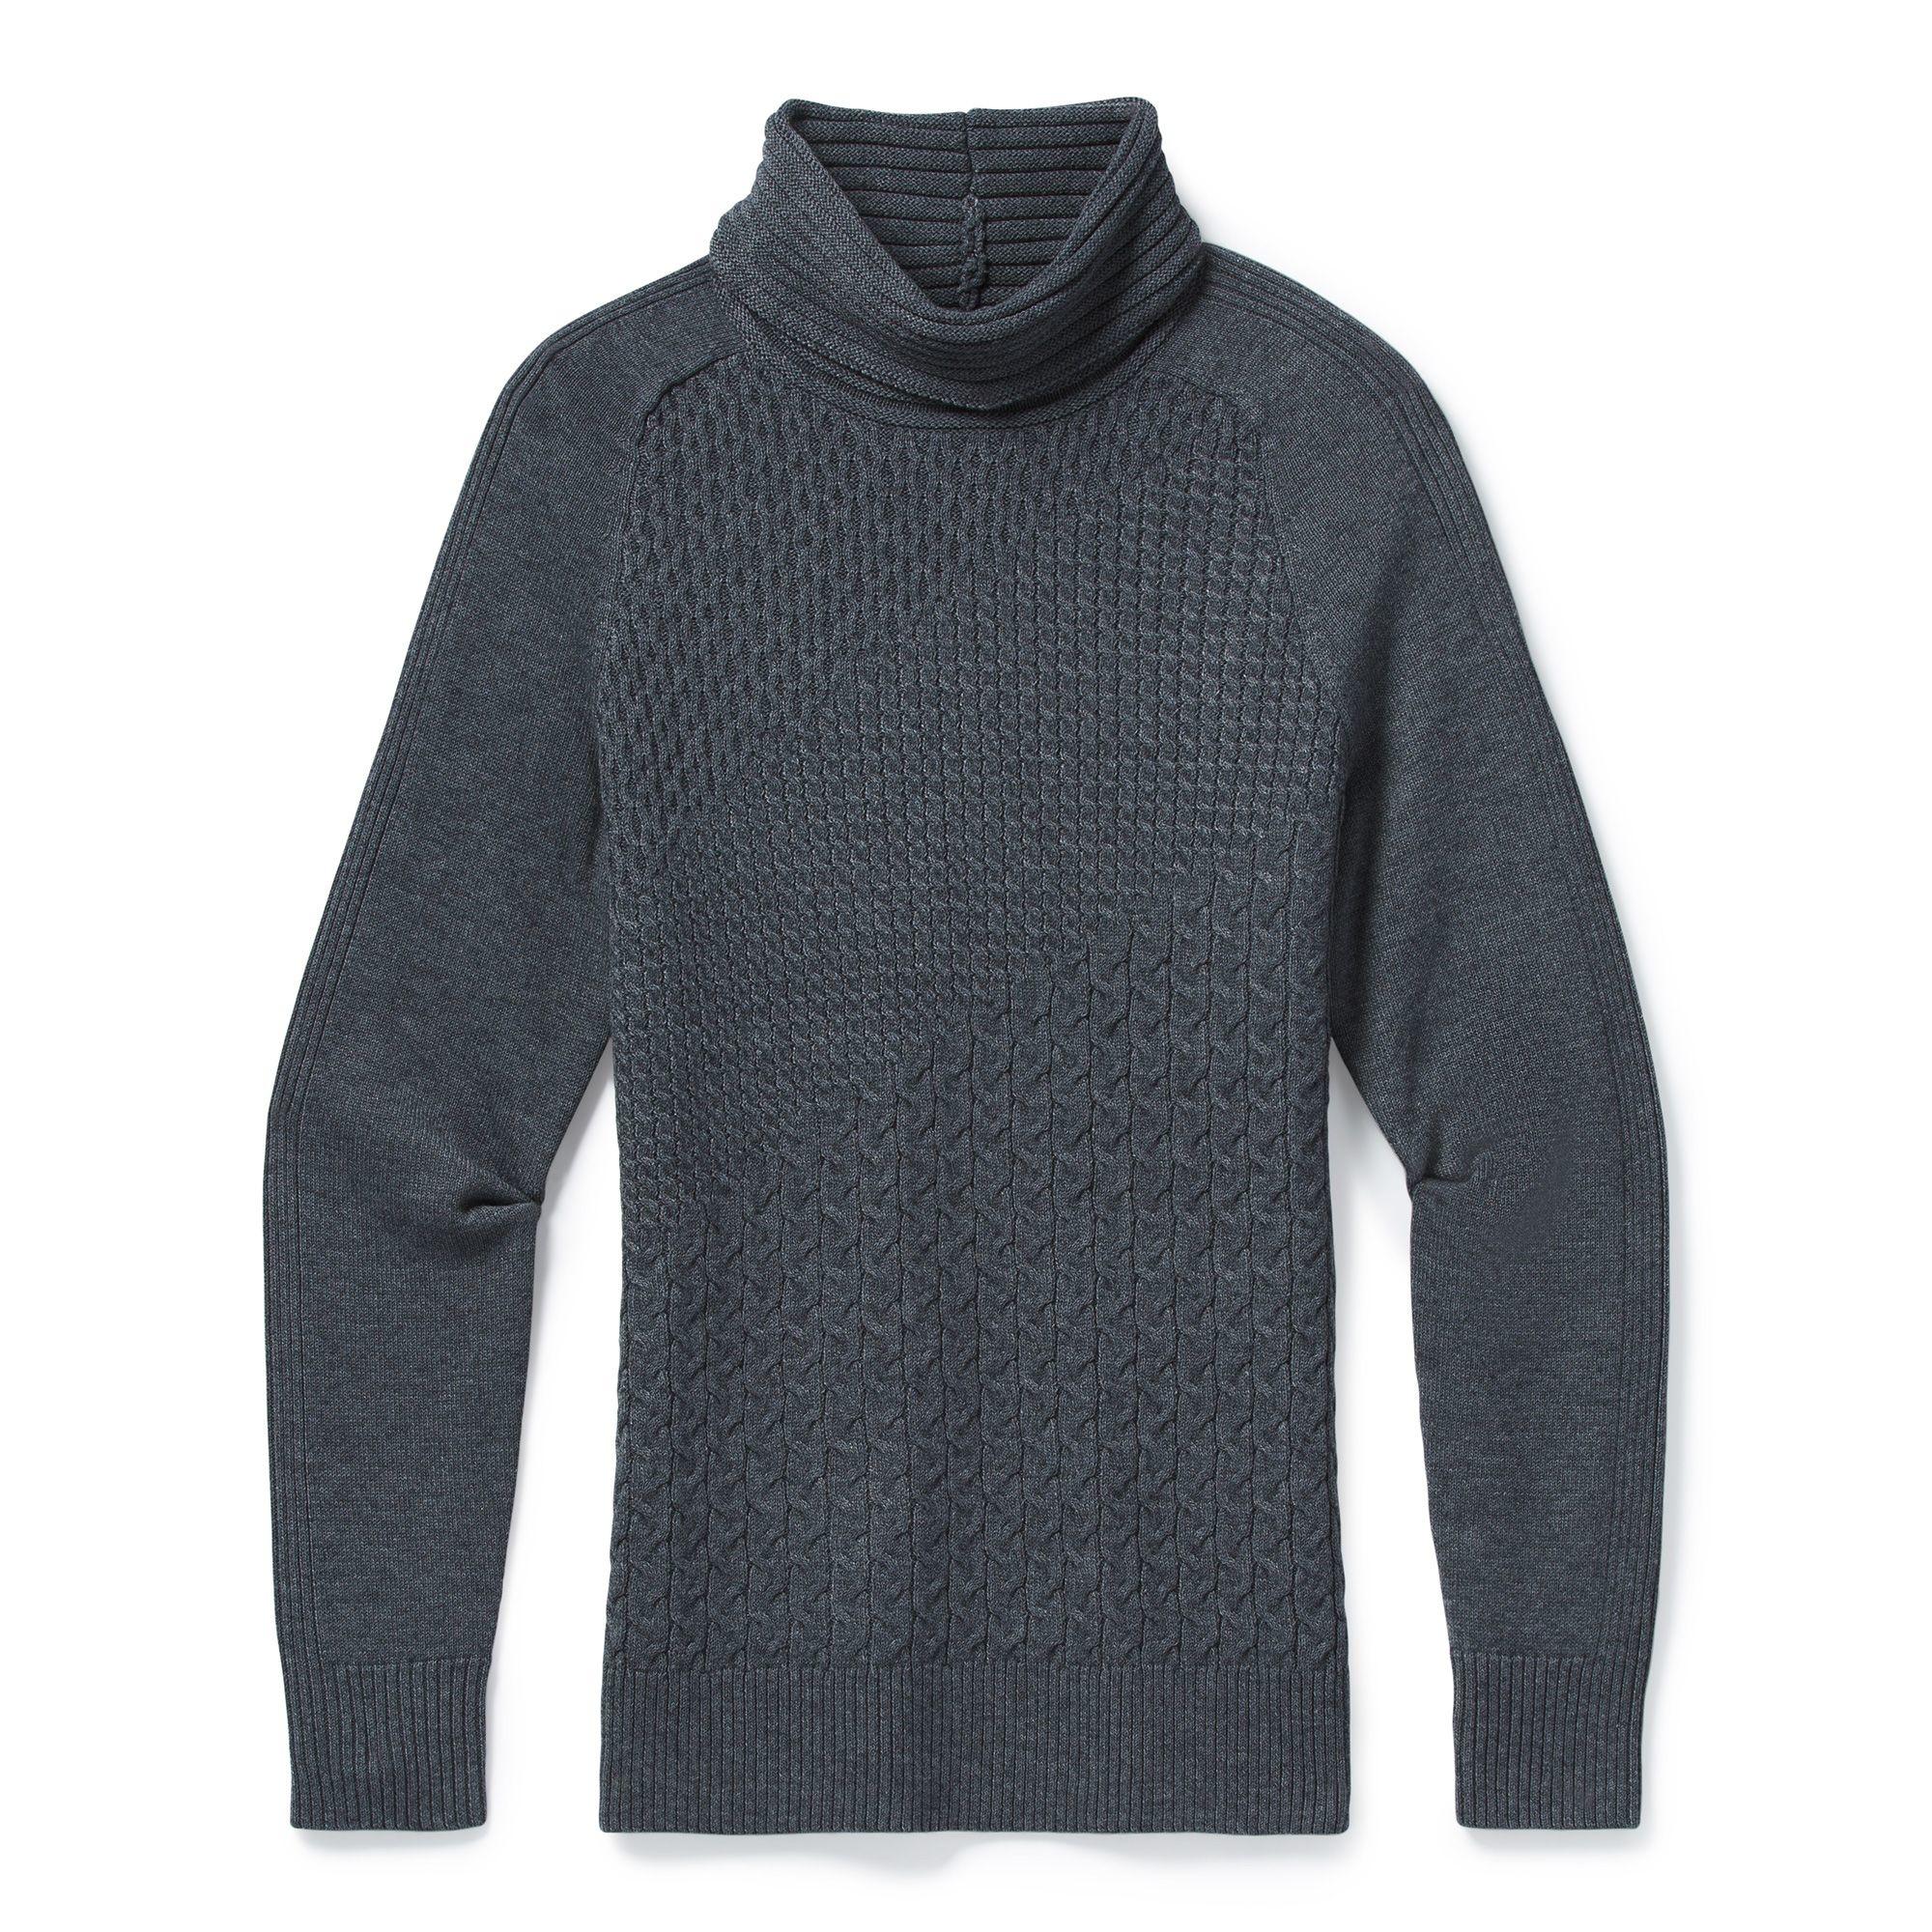 Smartwool Dacono Ski Sweater, Medium Gray